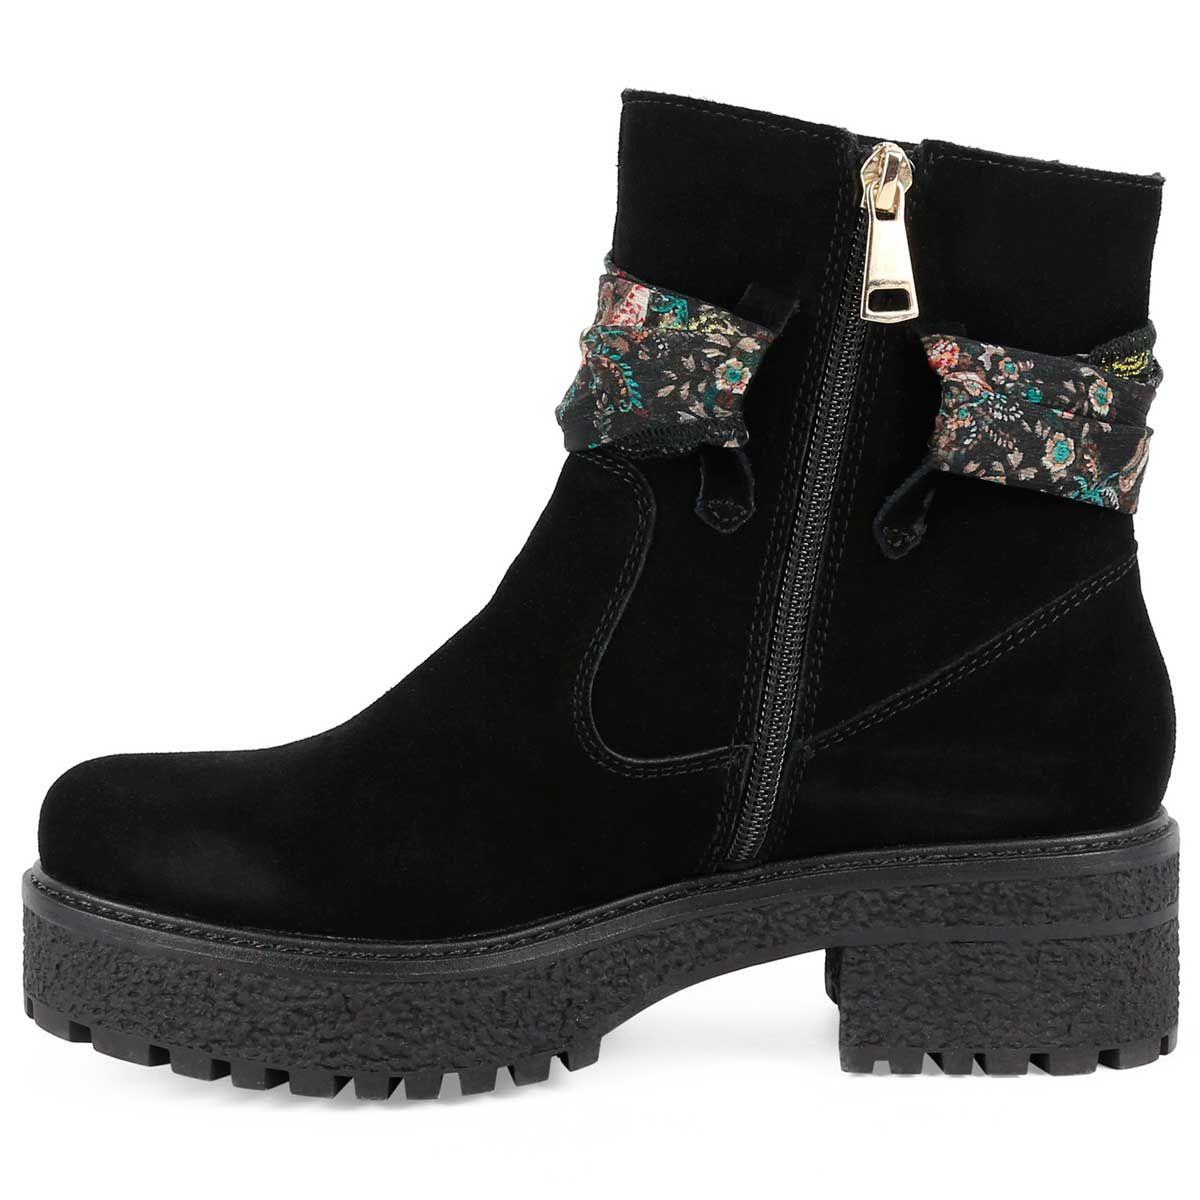 Montevita Scarf Tie Ankle Boot in Black